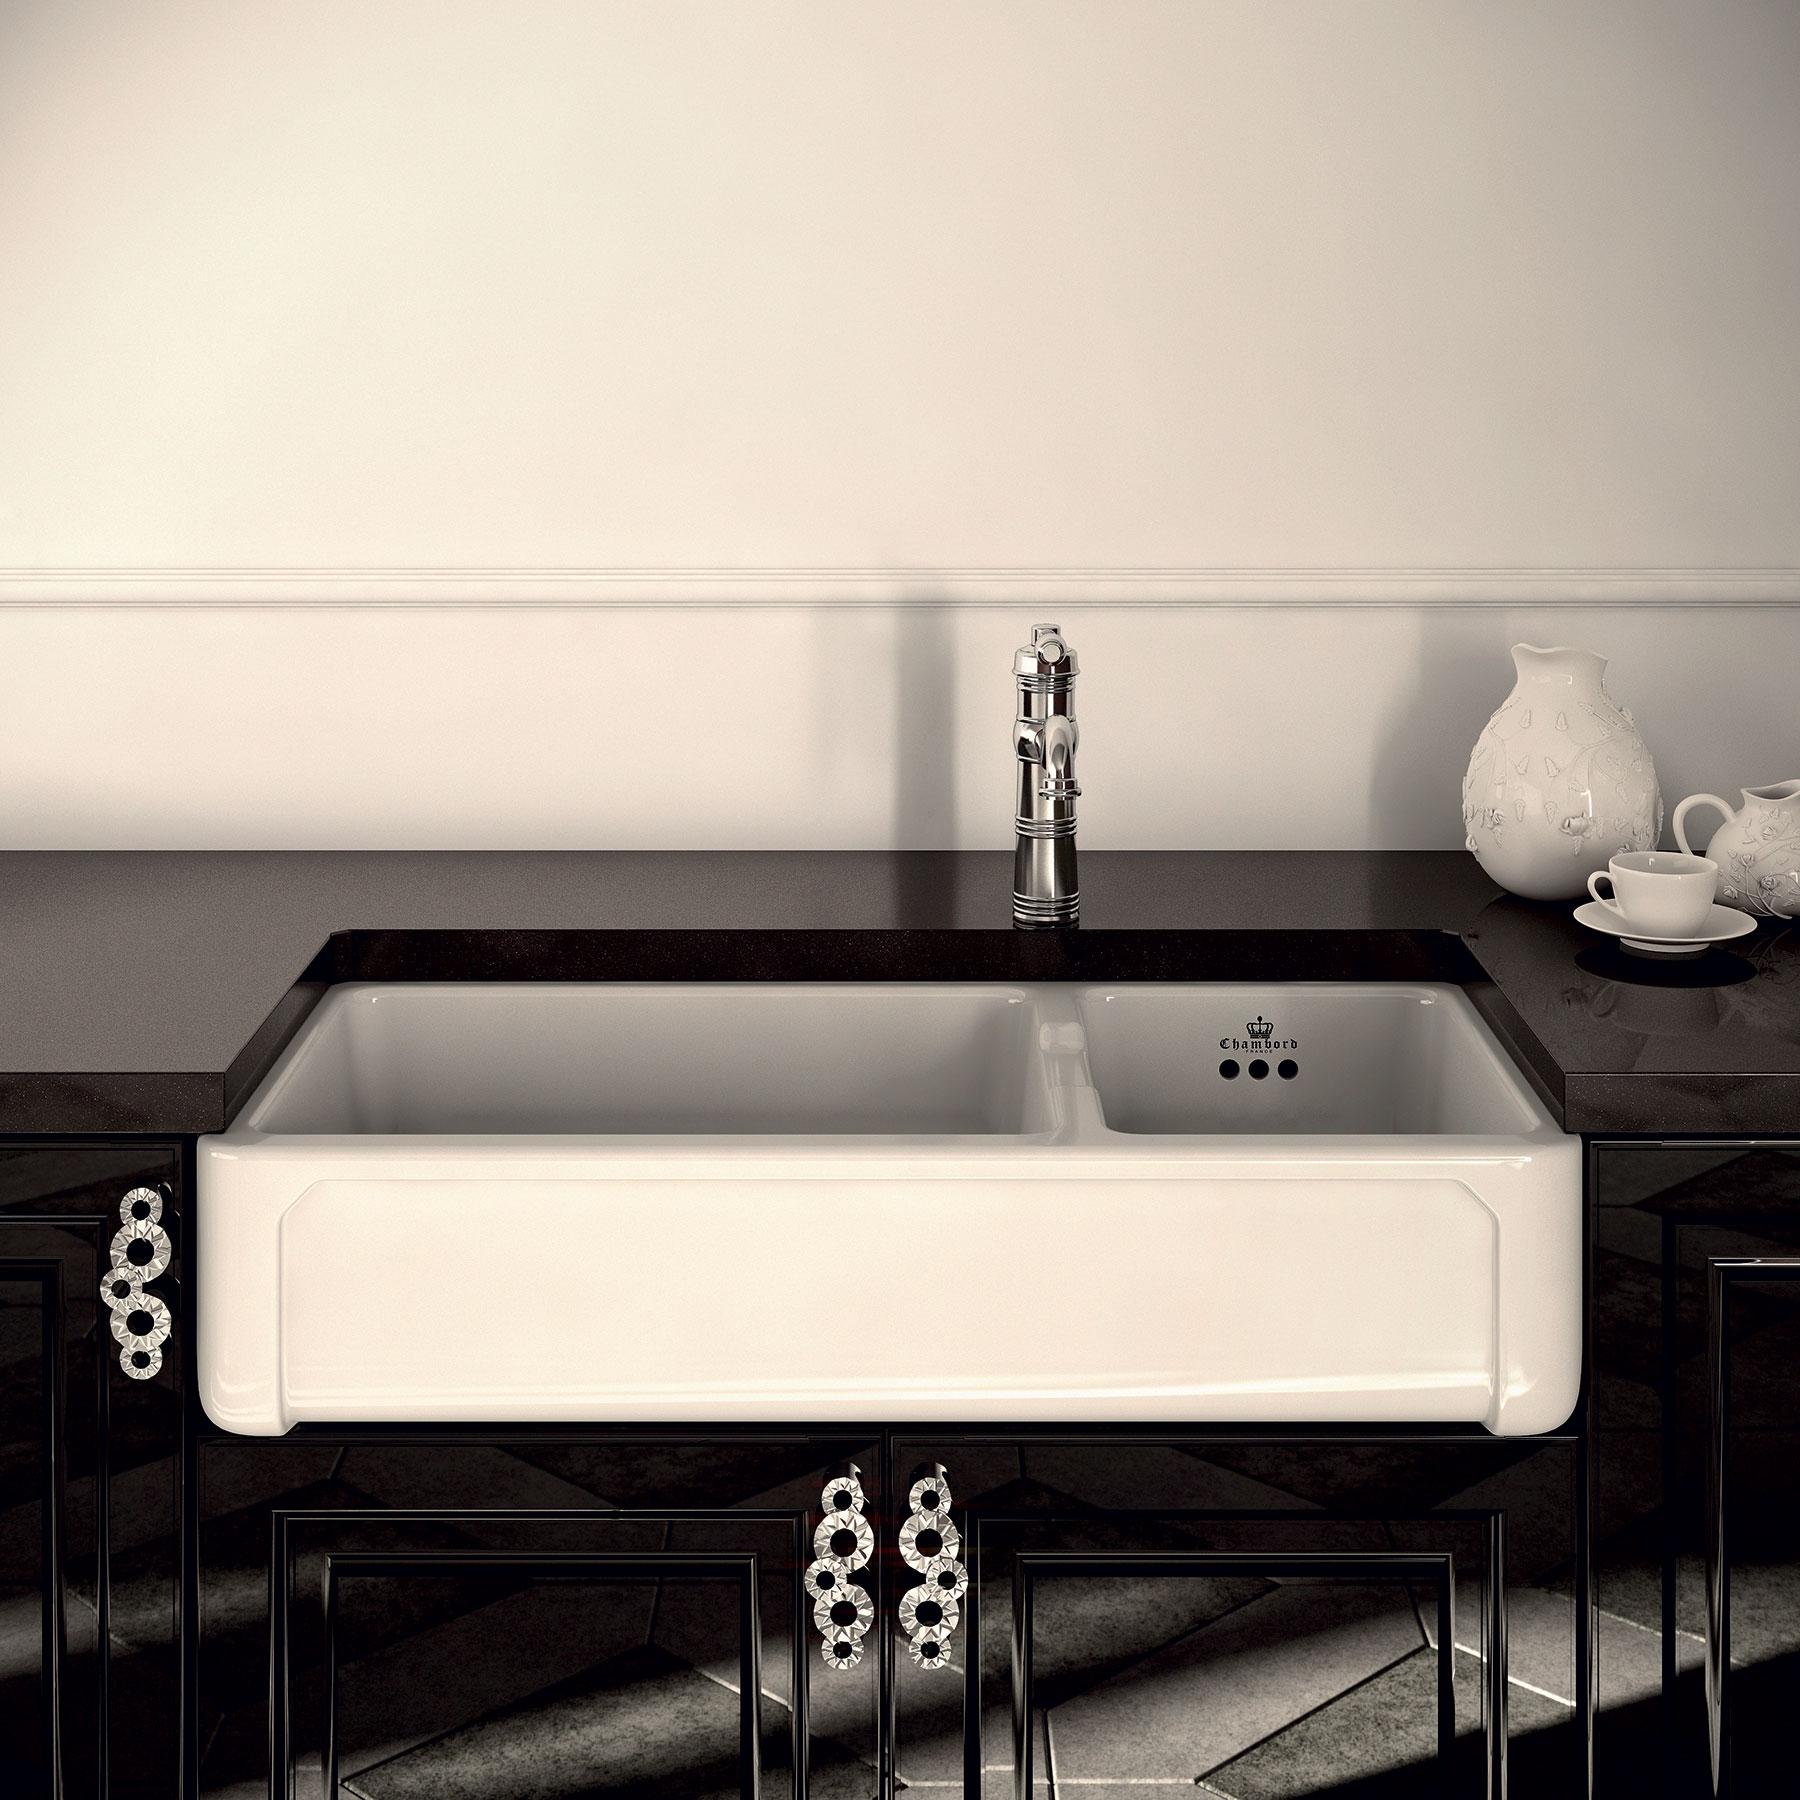 Transitional Henri III Farmhouse Kitchen Sink